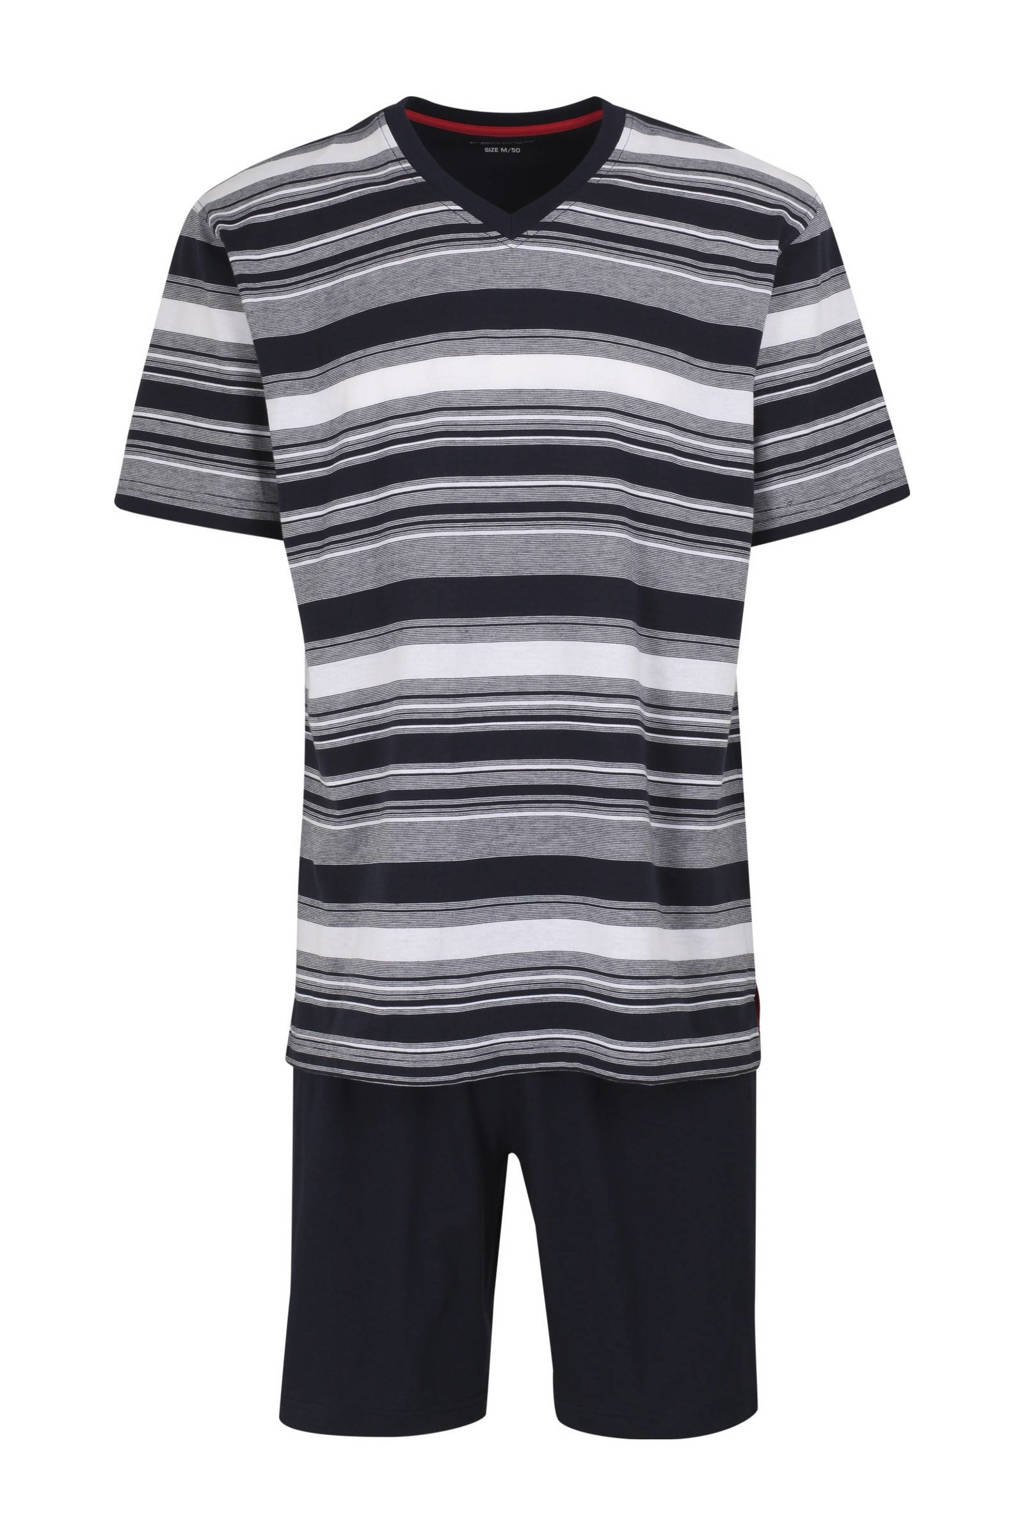 Ceceba shortama met strepen donkerblauw/wit, Donkerblauw/wit